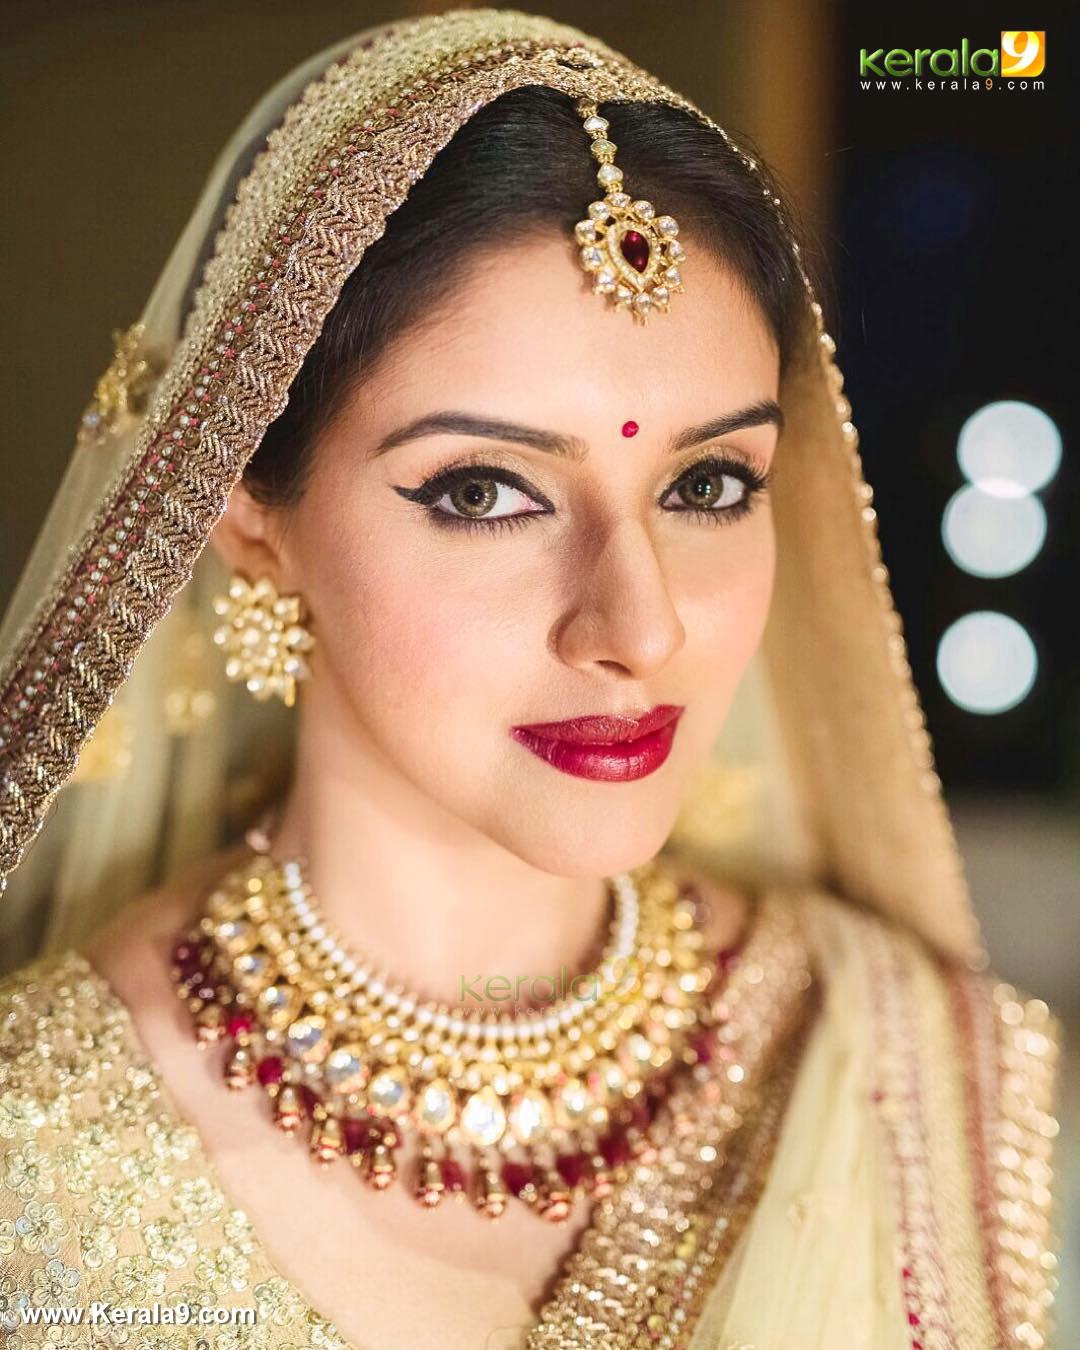 asin hindu wedding photos 0934 00